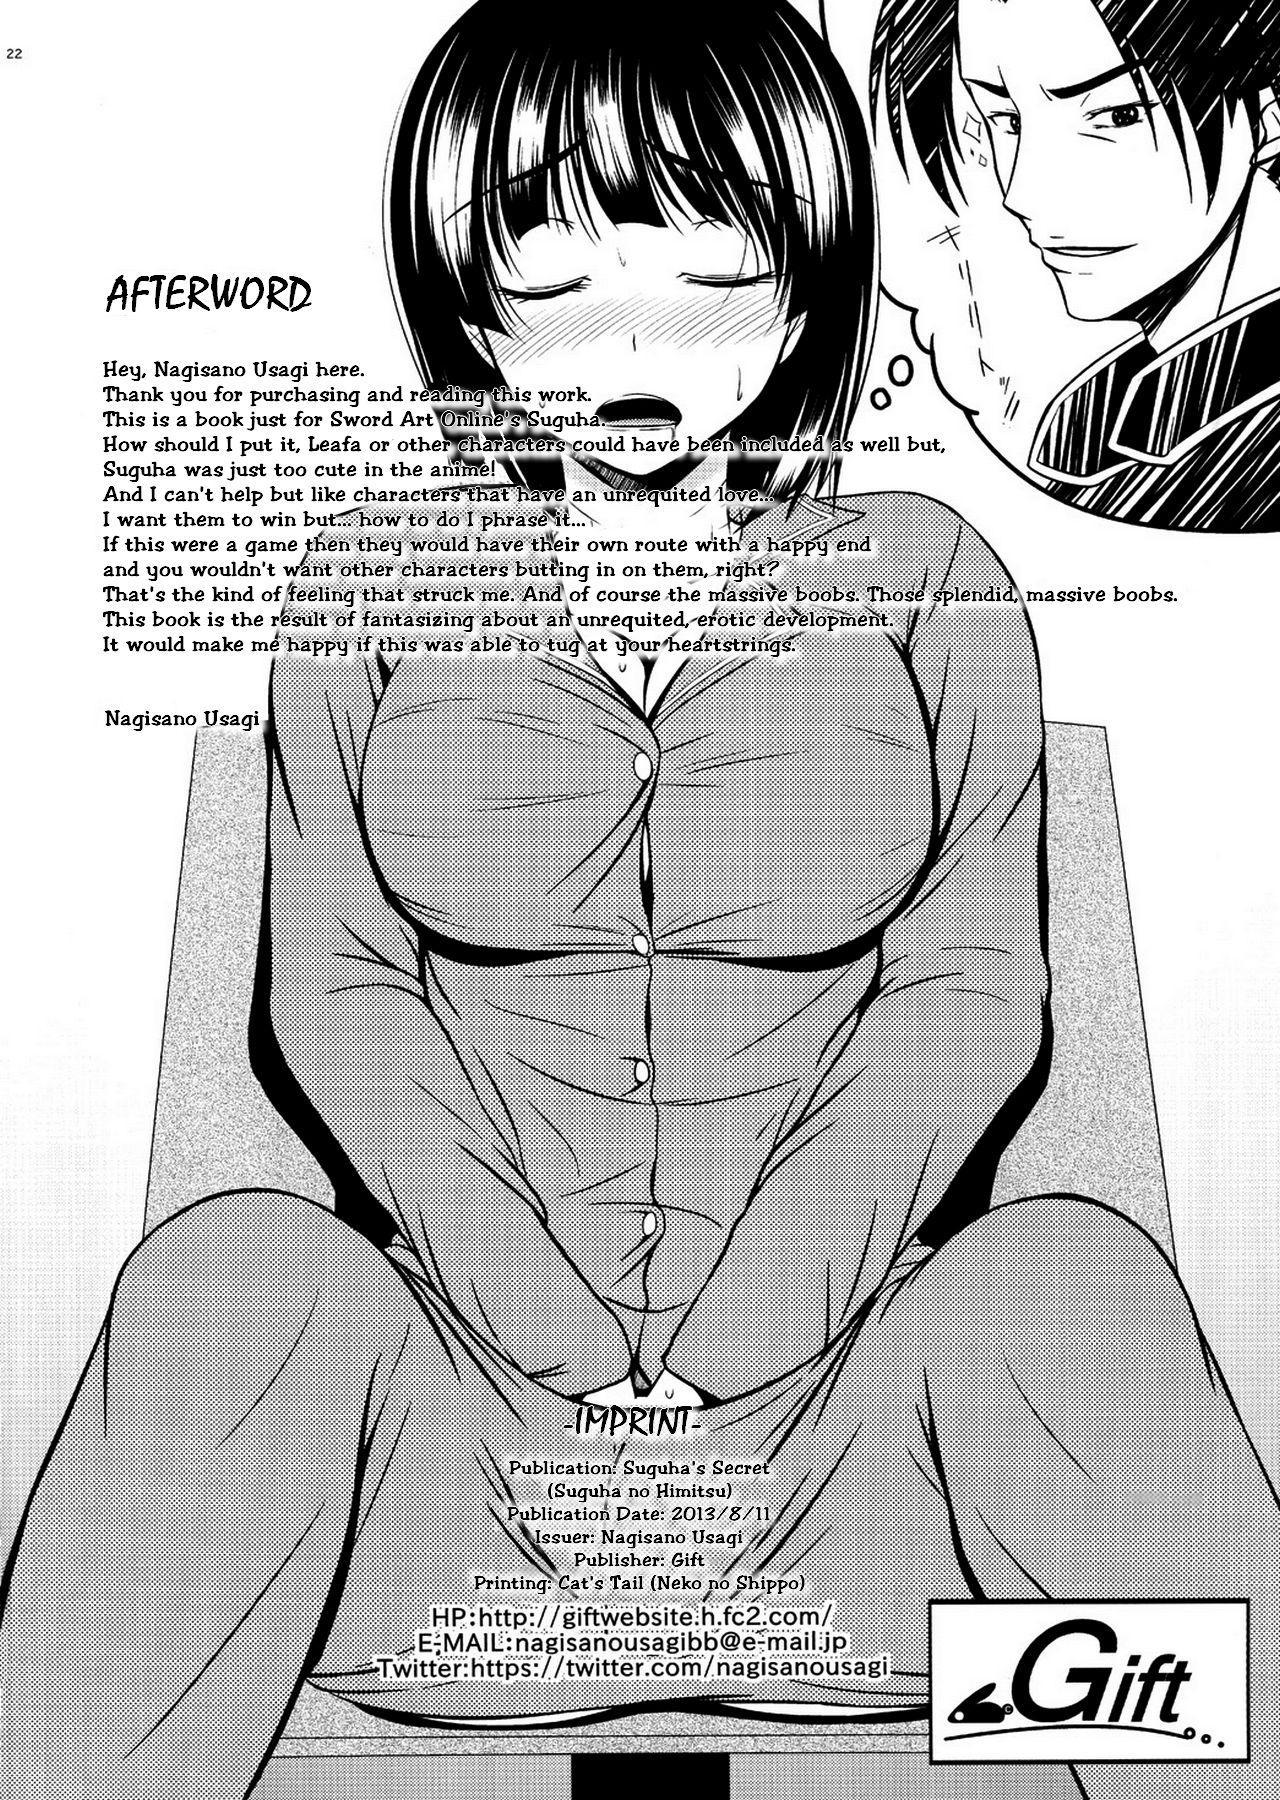 Suguha no Himitsu | Suguha's Secret 20